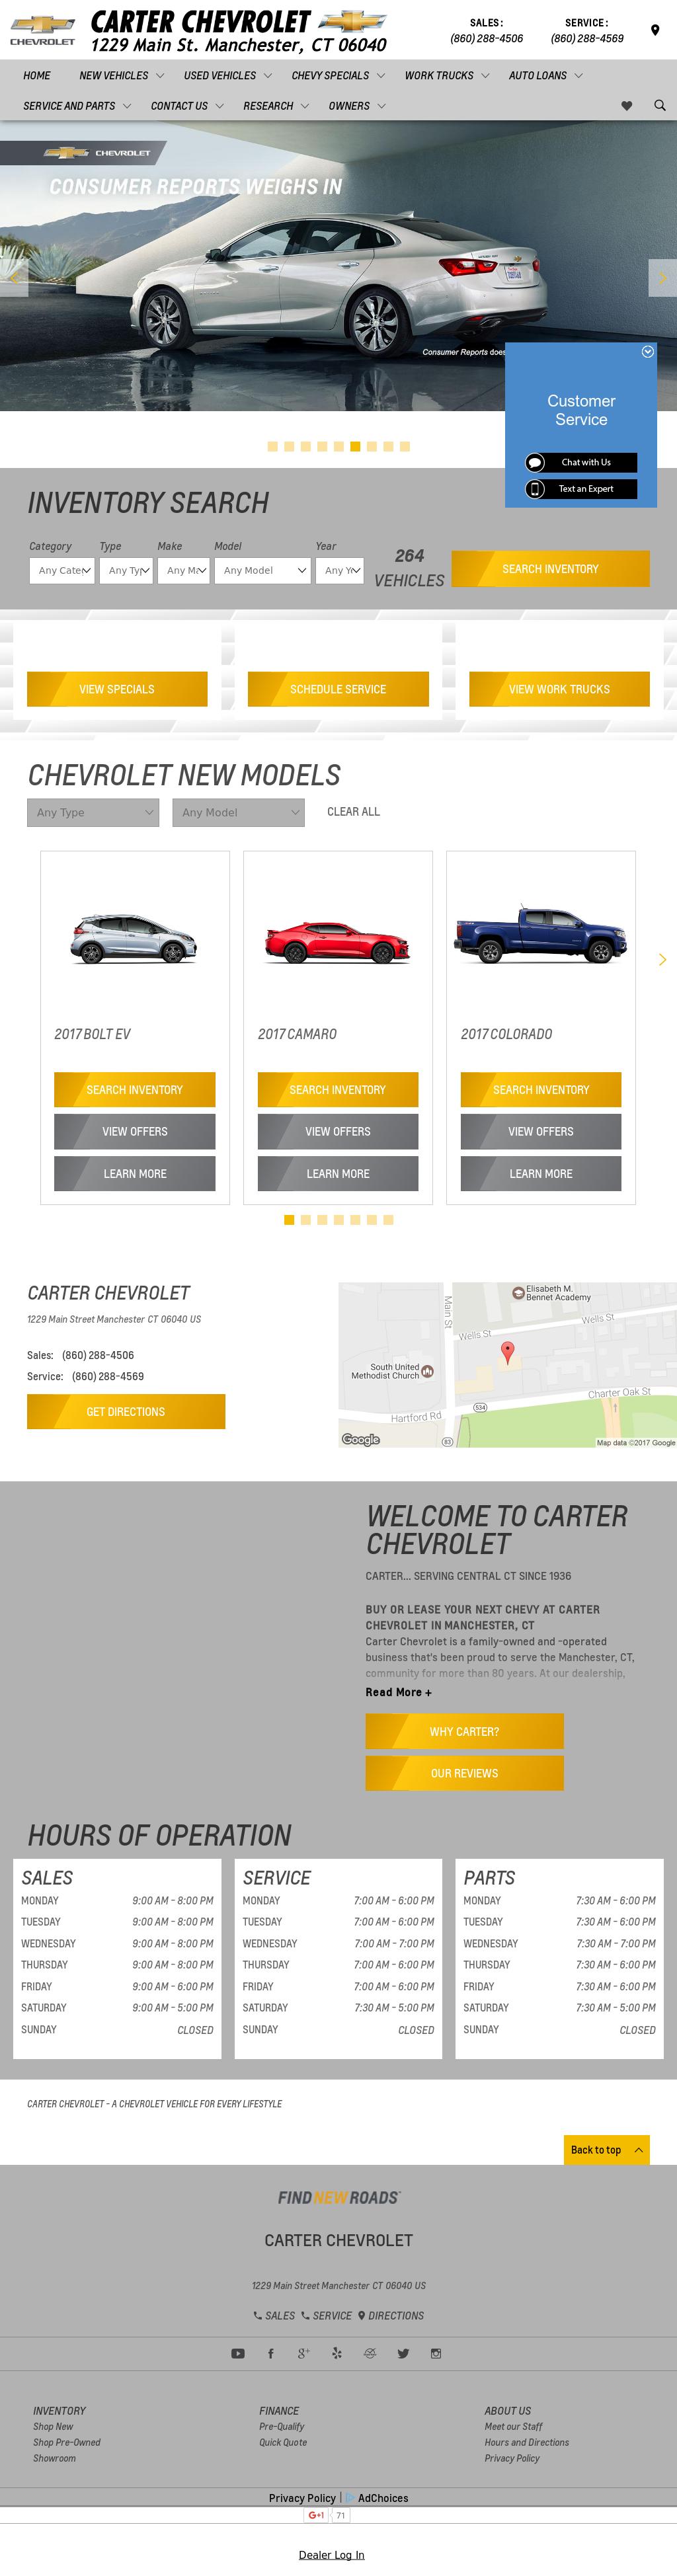 Exceptional Carter Chevrolet U0026 Mazda Of Manchester Website History